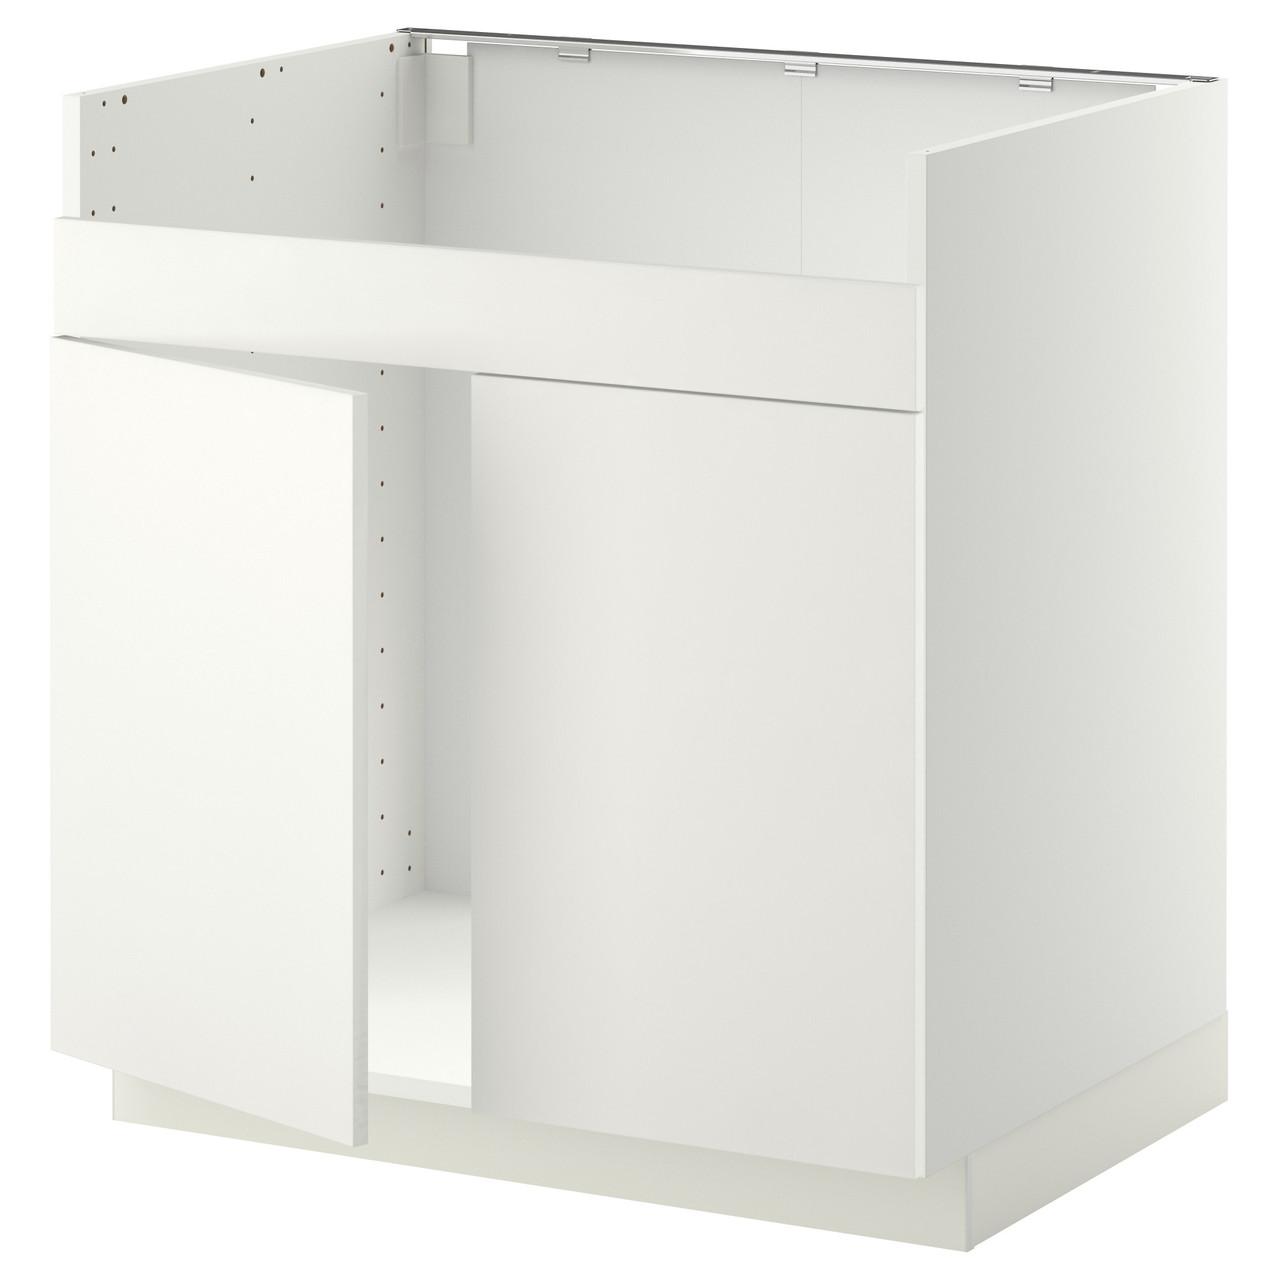 Тумба под раковину IKEA METOD HAVSEN 80x60 см Häggeby белая 892.802.81